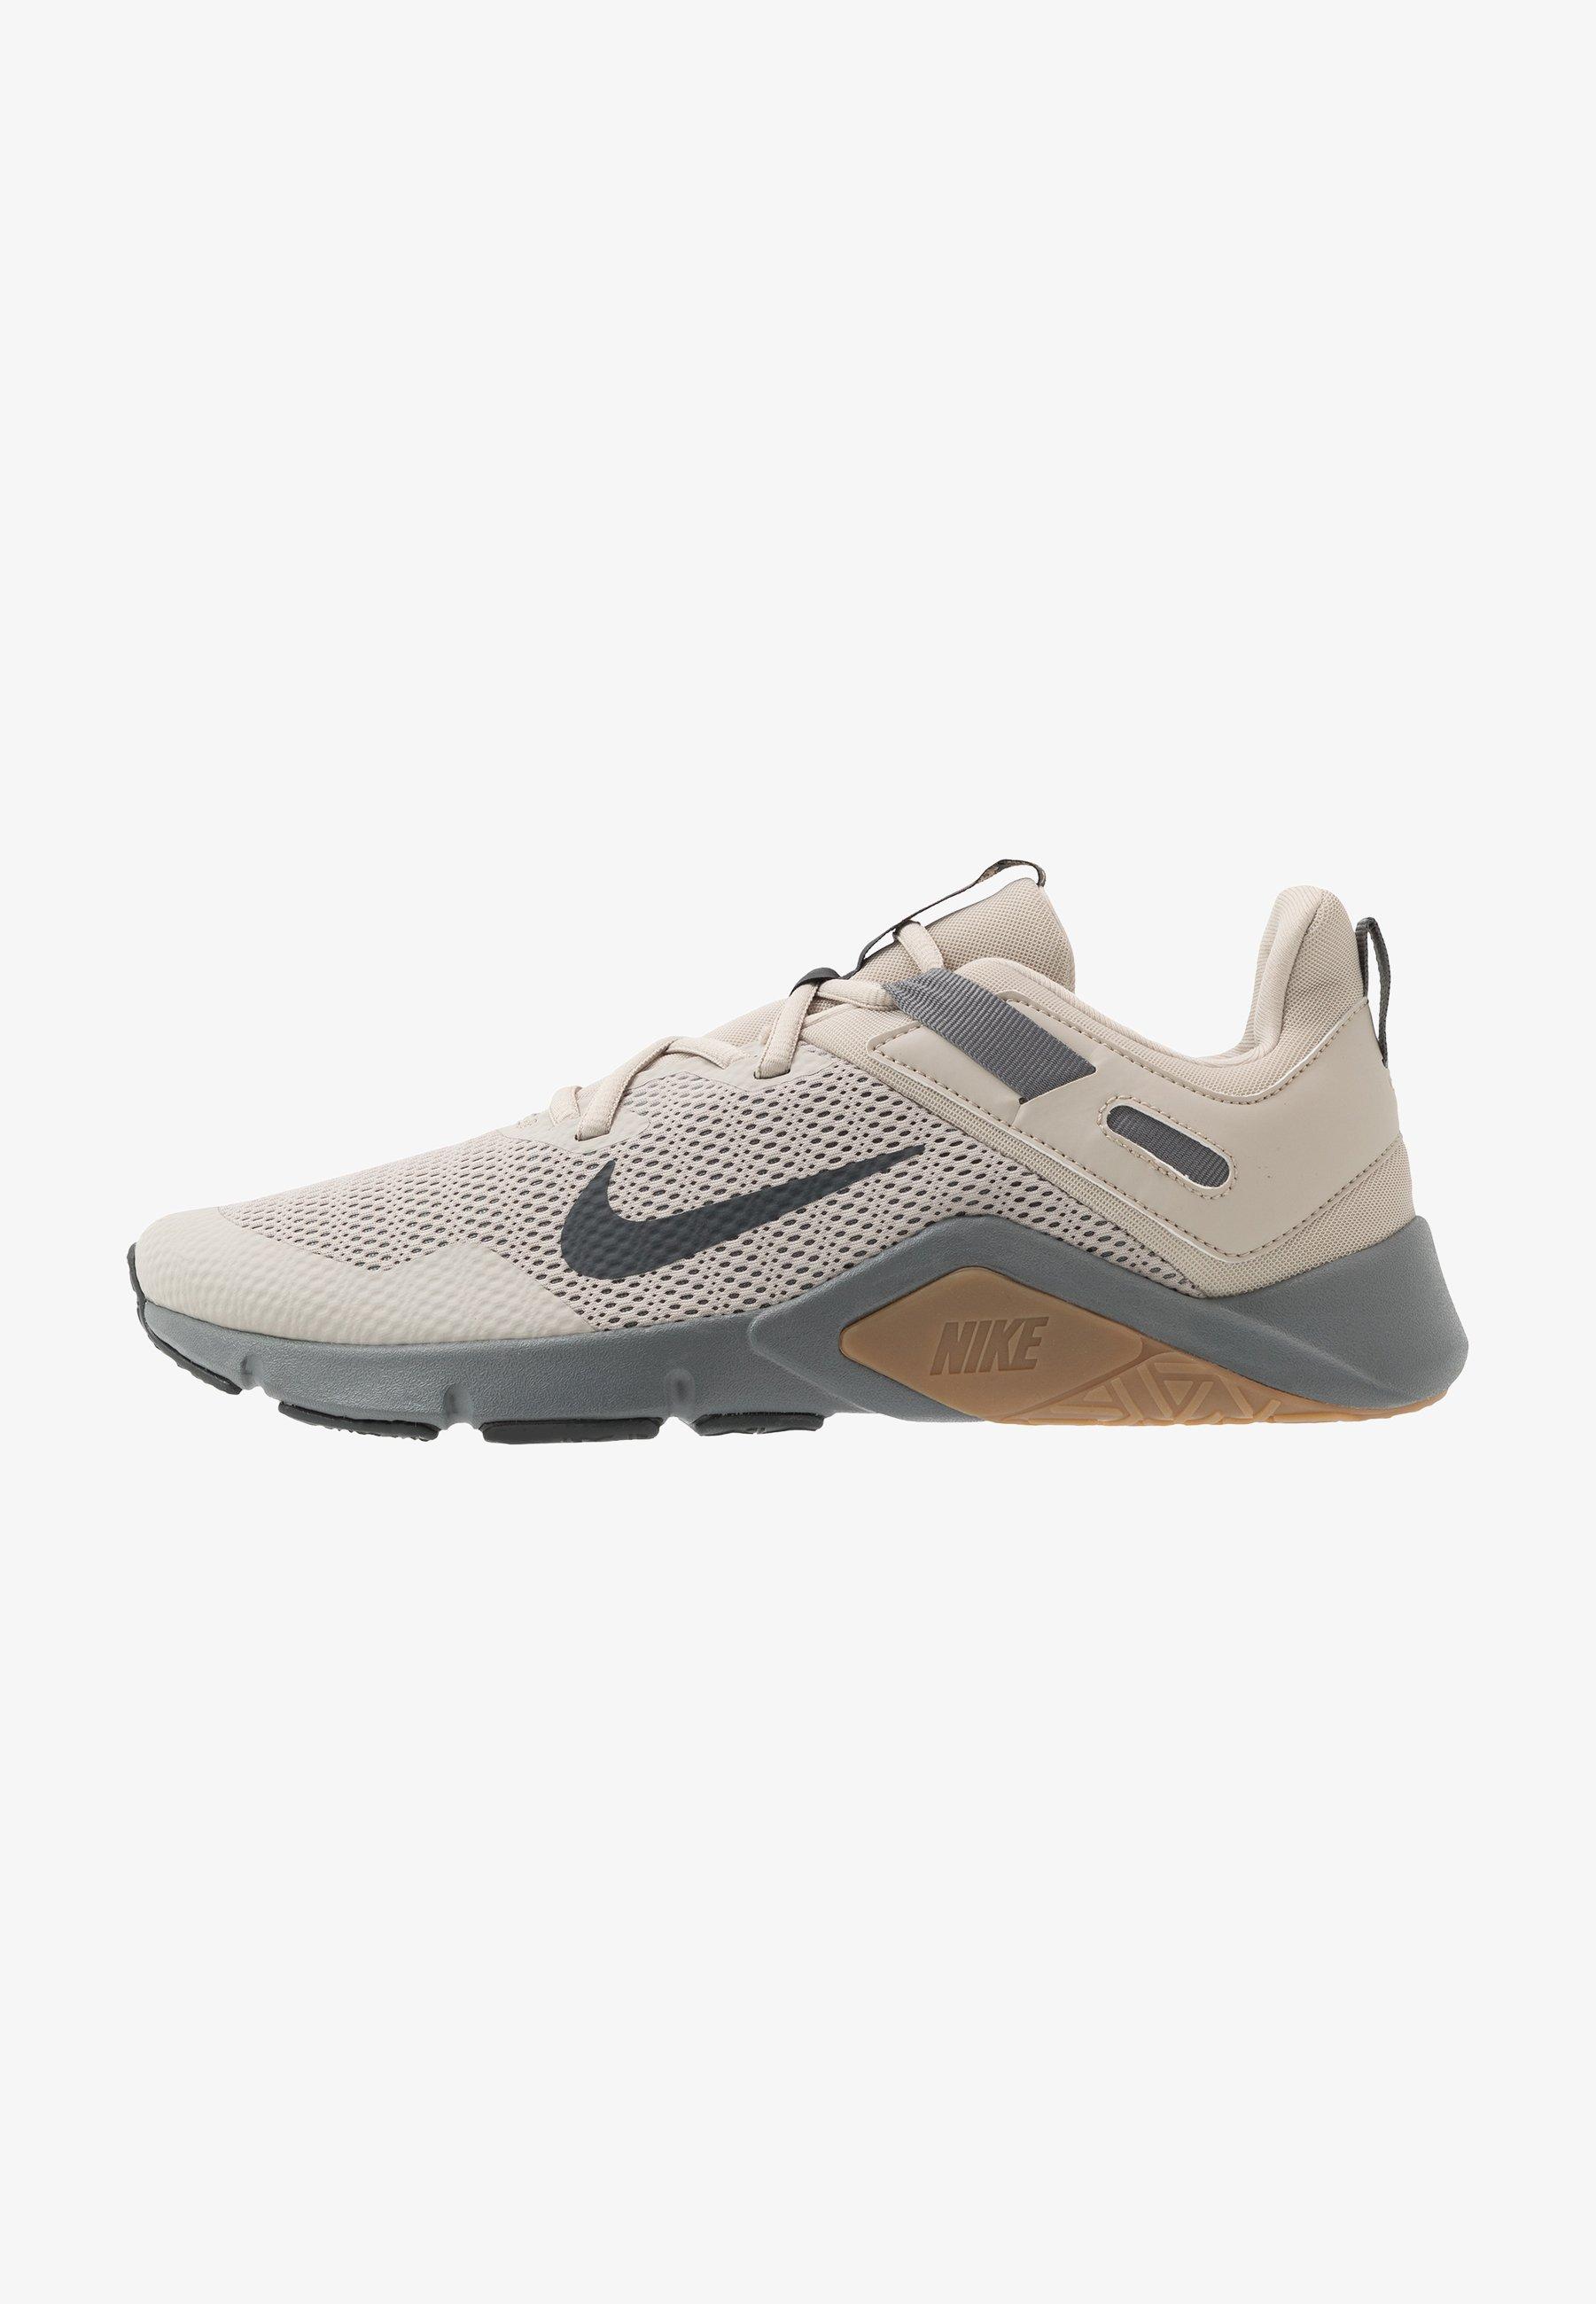 veredicto Canciones infantiles Permuta  Nike Performance LEGEND ESSENTIAL - Sports shoes - string/dark smoke  grey/smoke grey/light brown - Zalando.ie